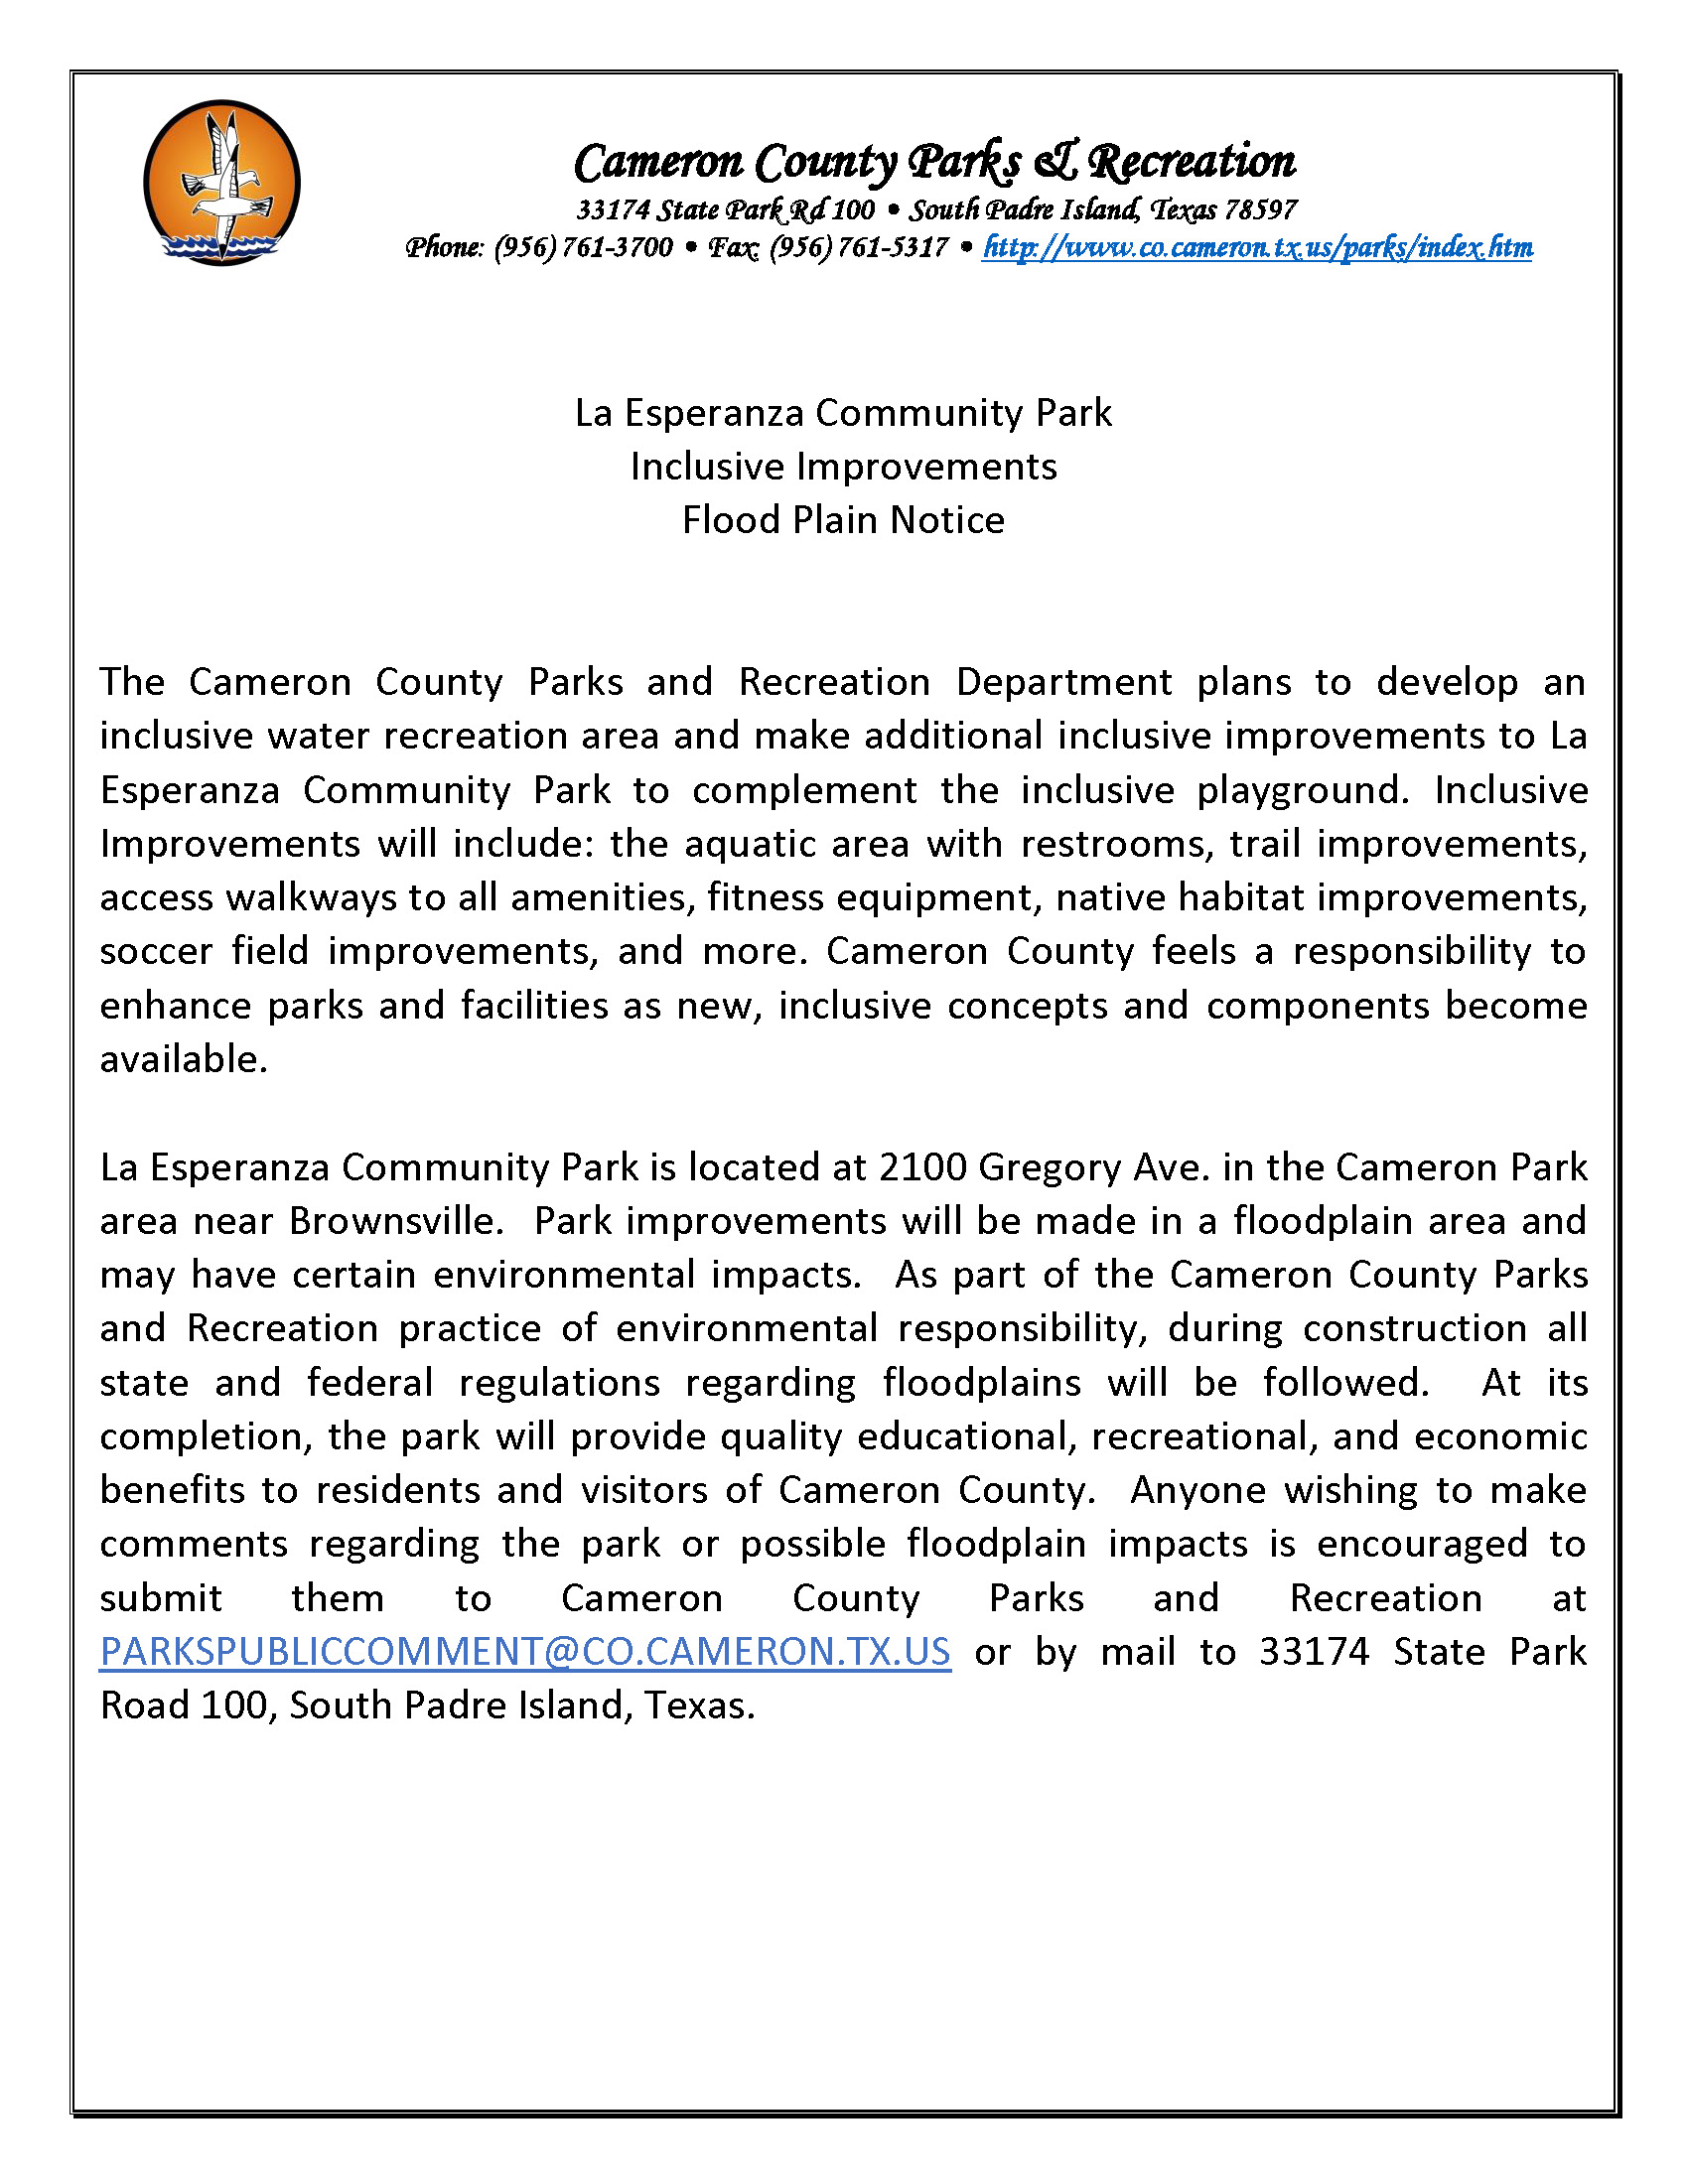 La Esperanza Community Park Inclusive Improvements Flood Plain Notice TPWD